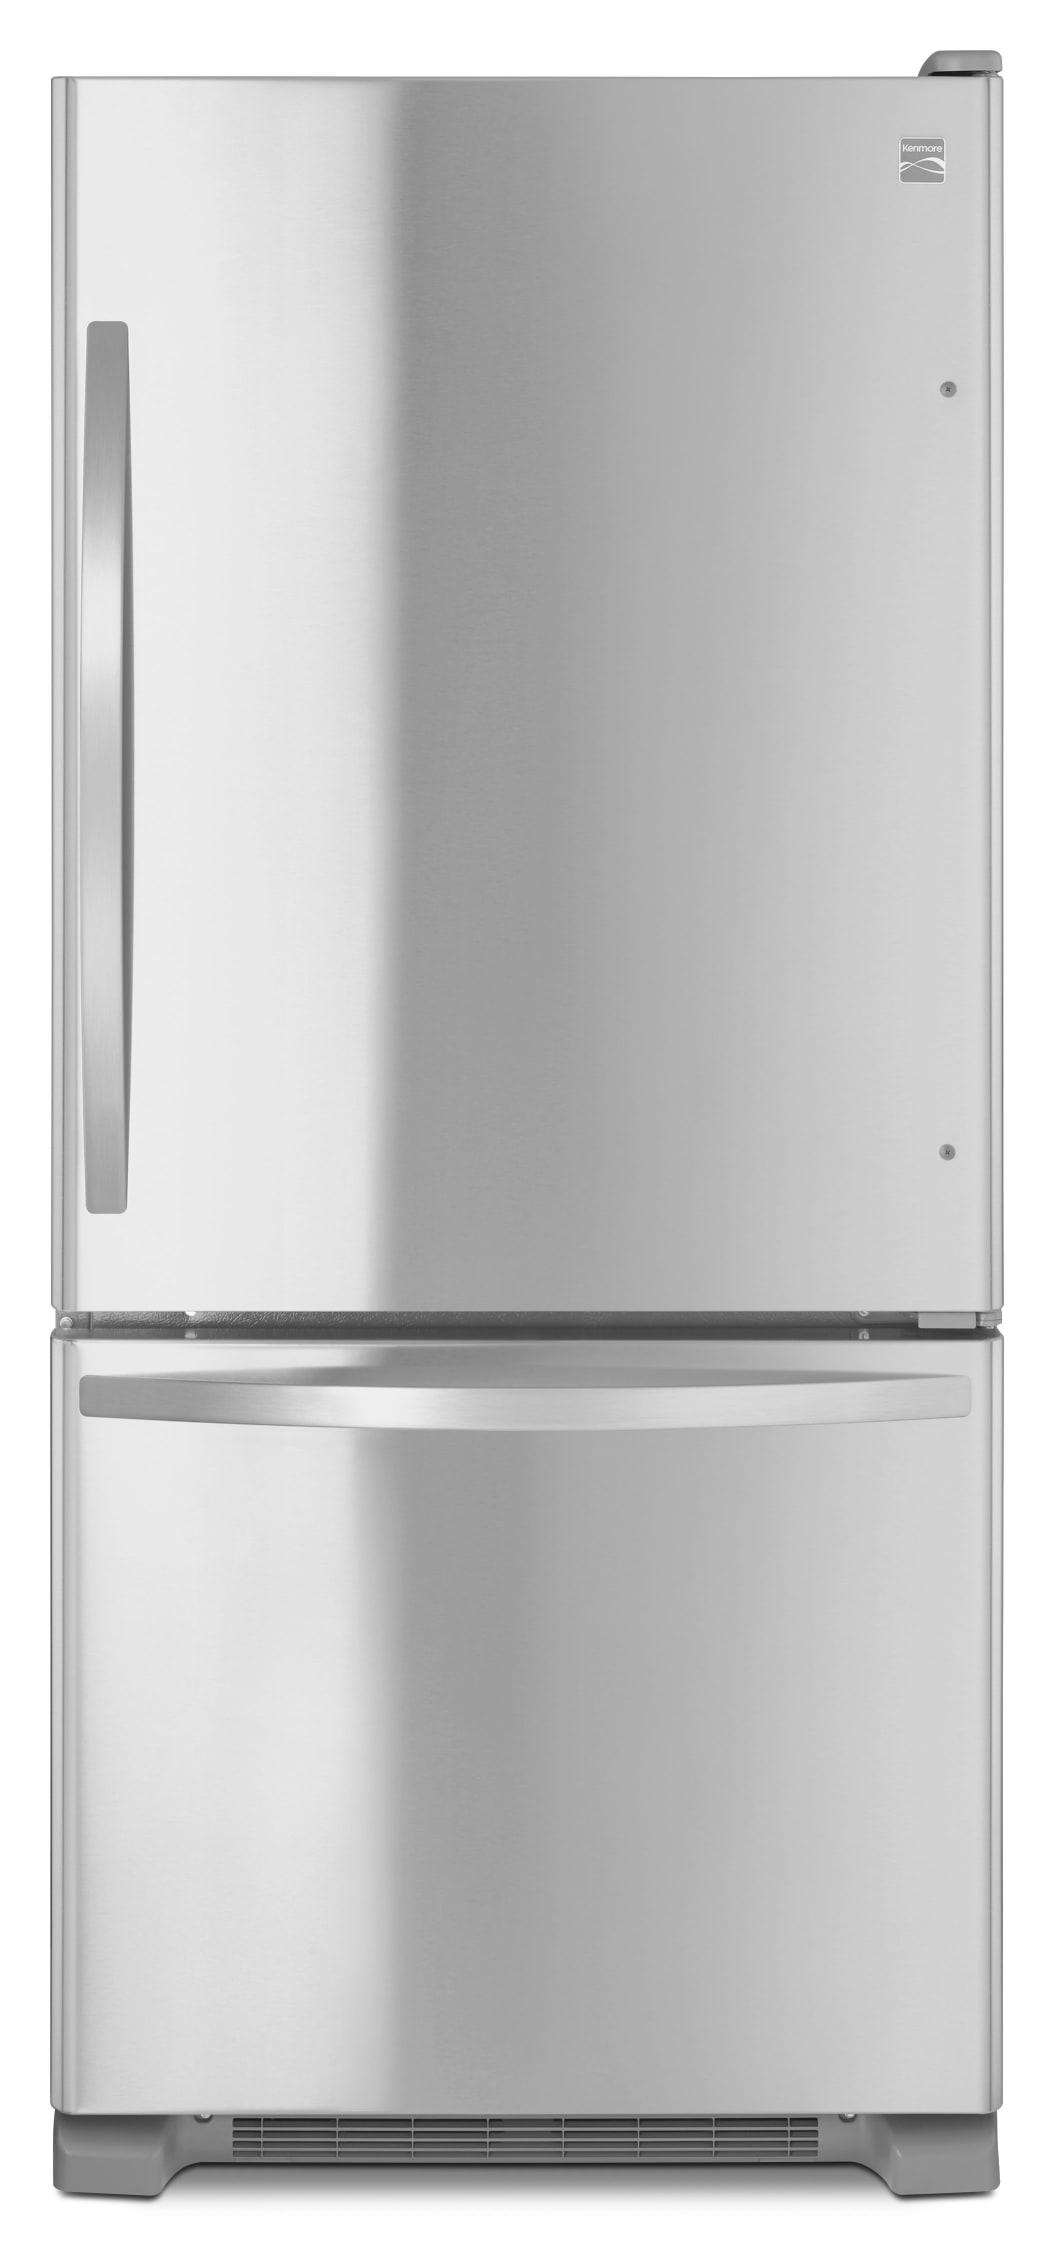 Kenmore Refrigerator Enervee Score 74 100